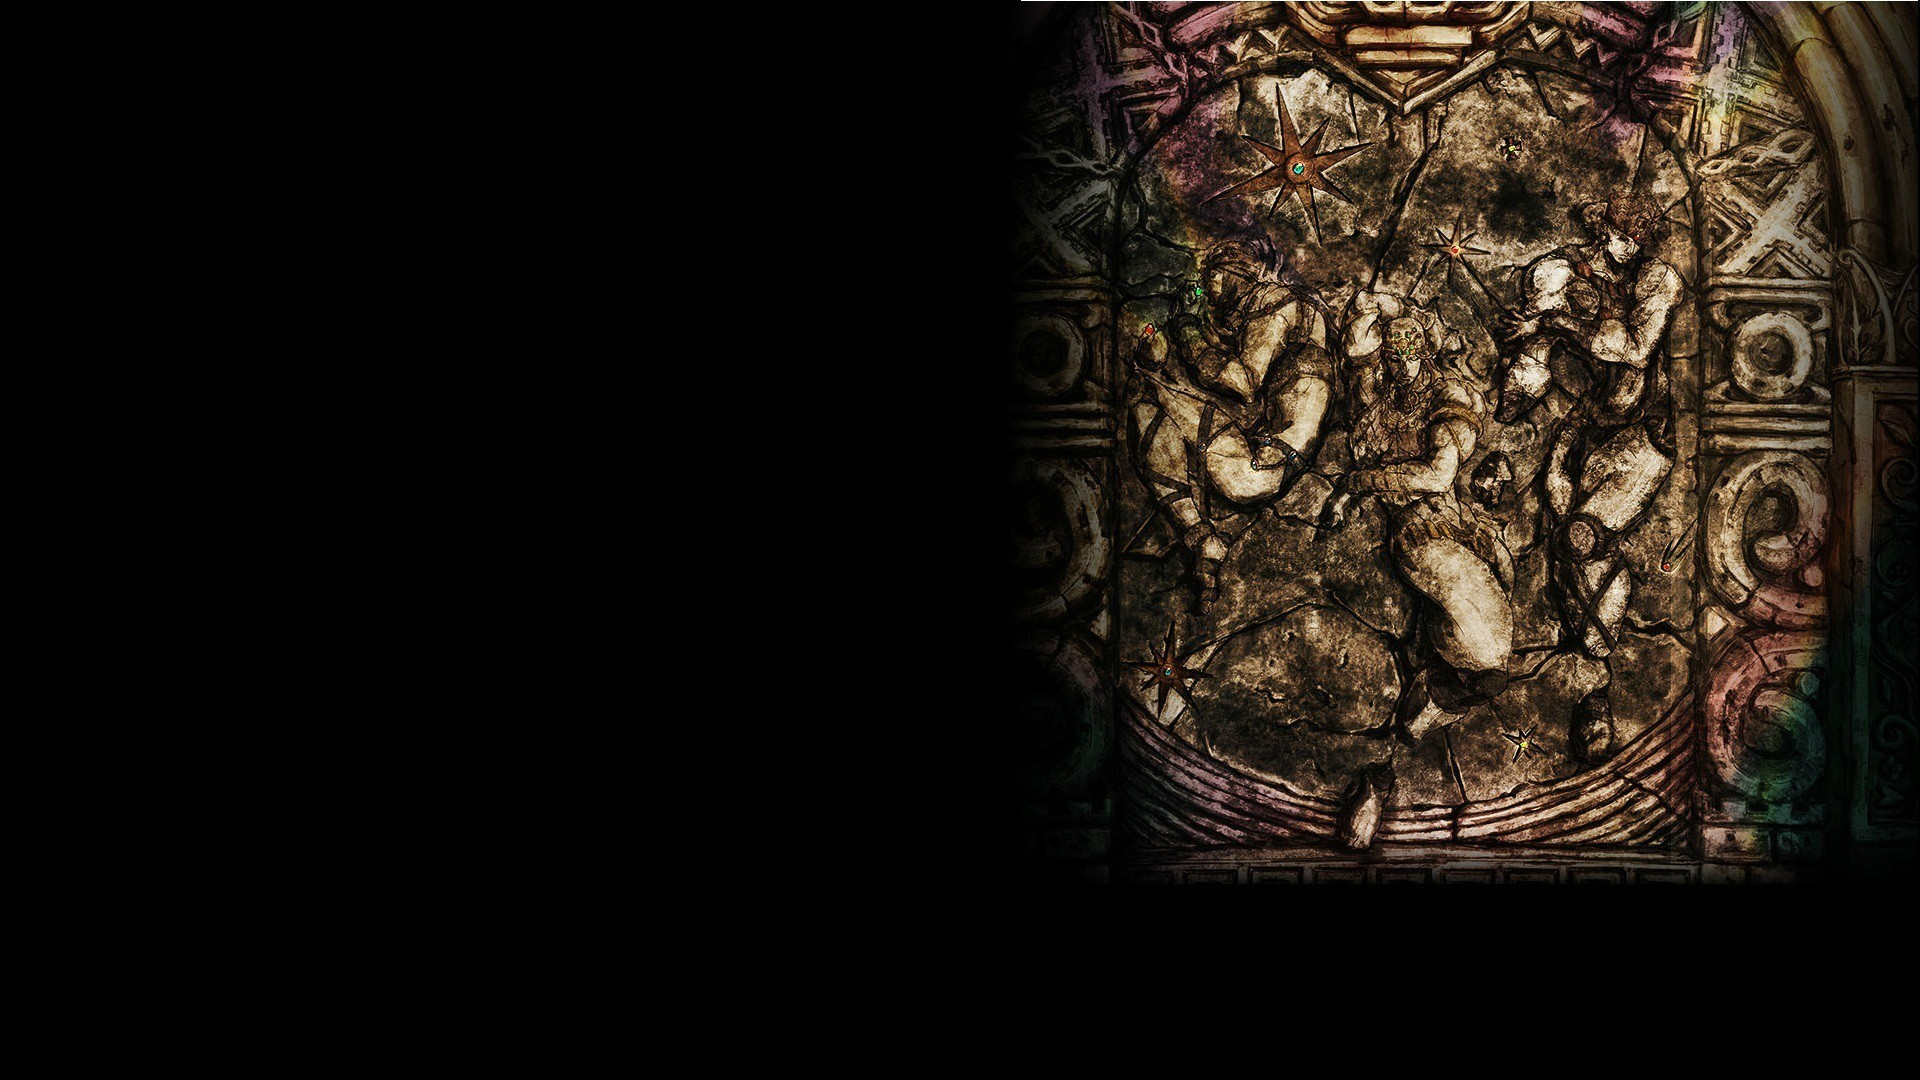 1 Pillar Men (Jojo's Bizarre Adventure) HD Wallpapers   Backgrounds –  Wallpaper Abyss